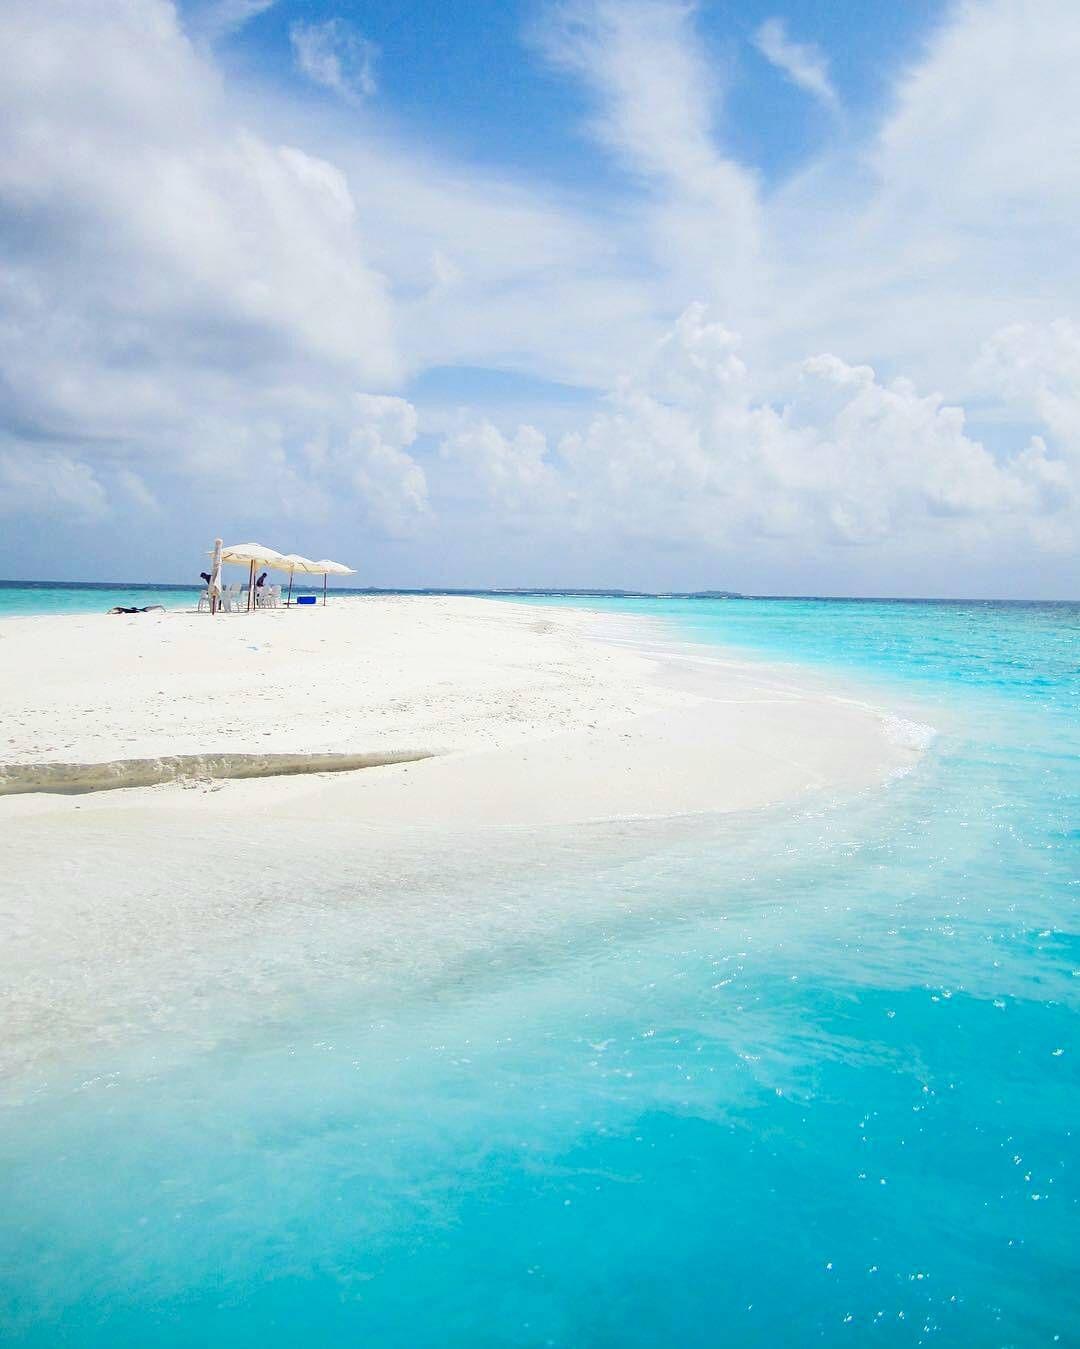 Maldives Beach: The Maldives Islands #Maldives